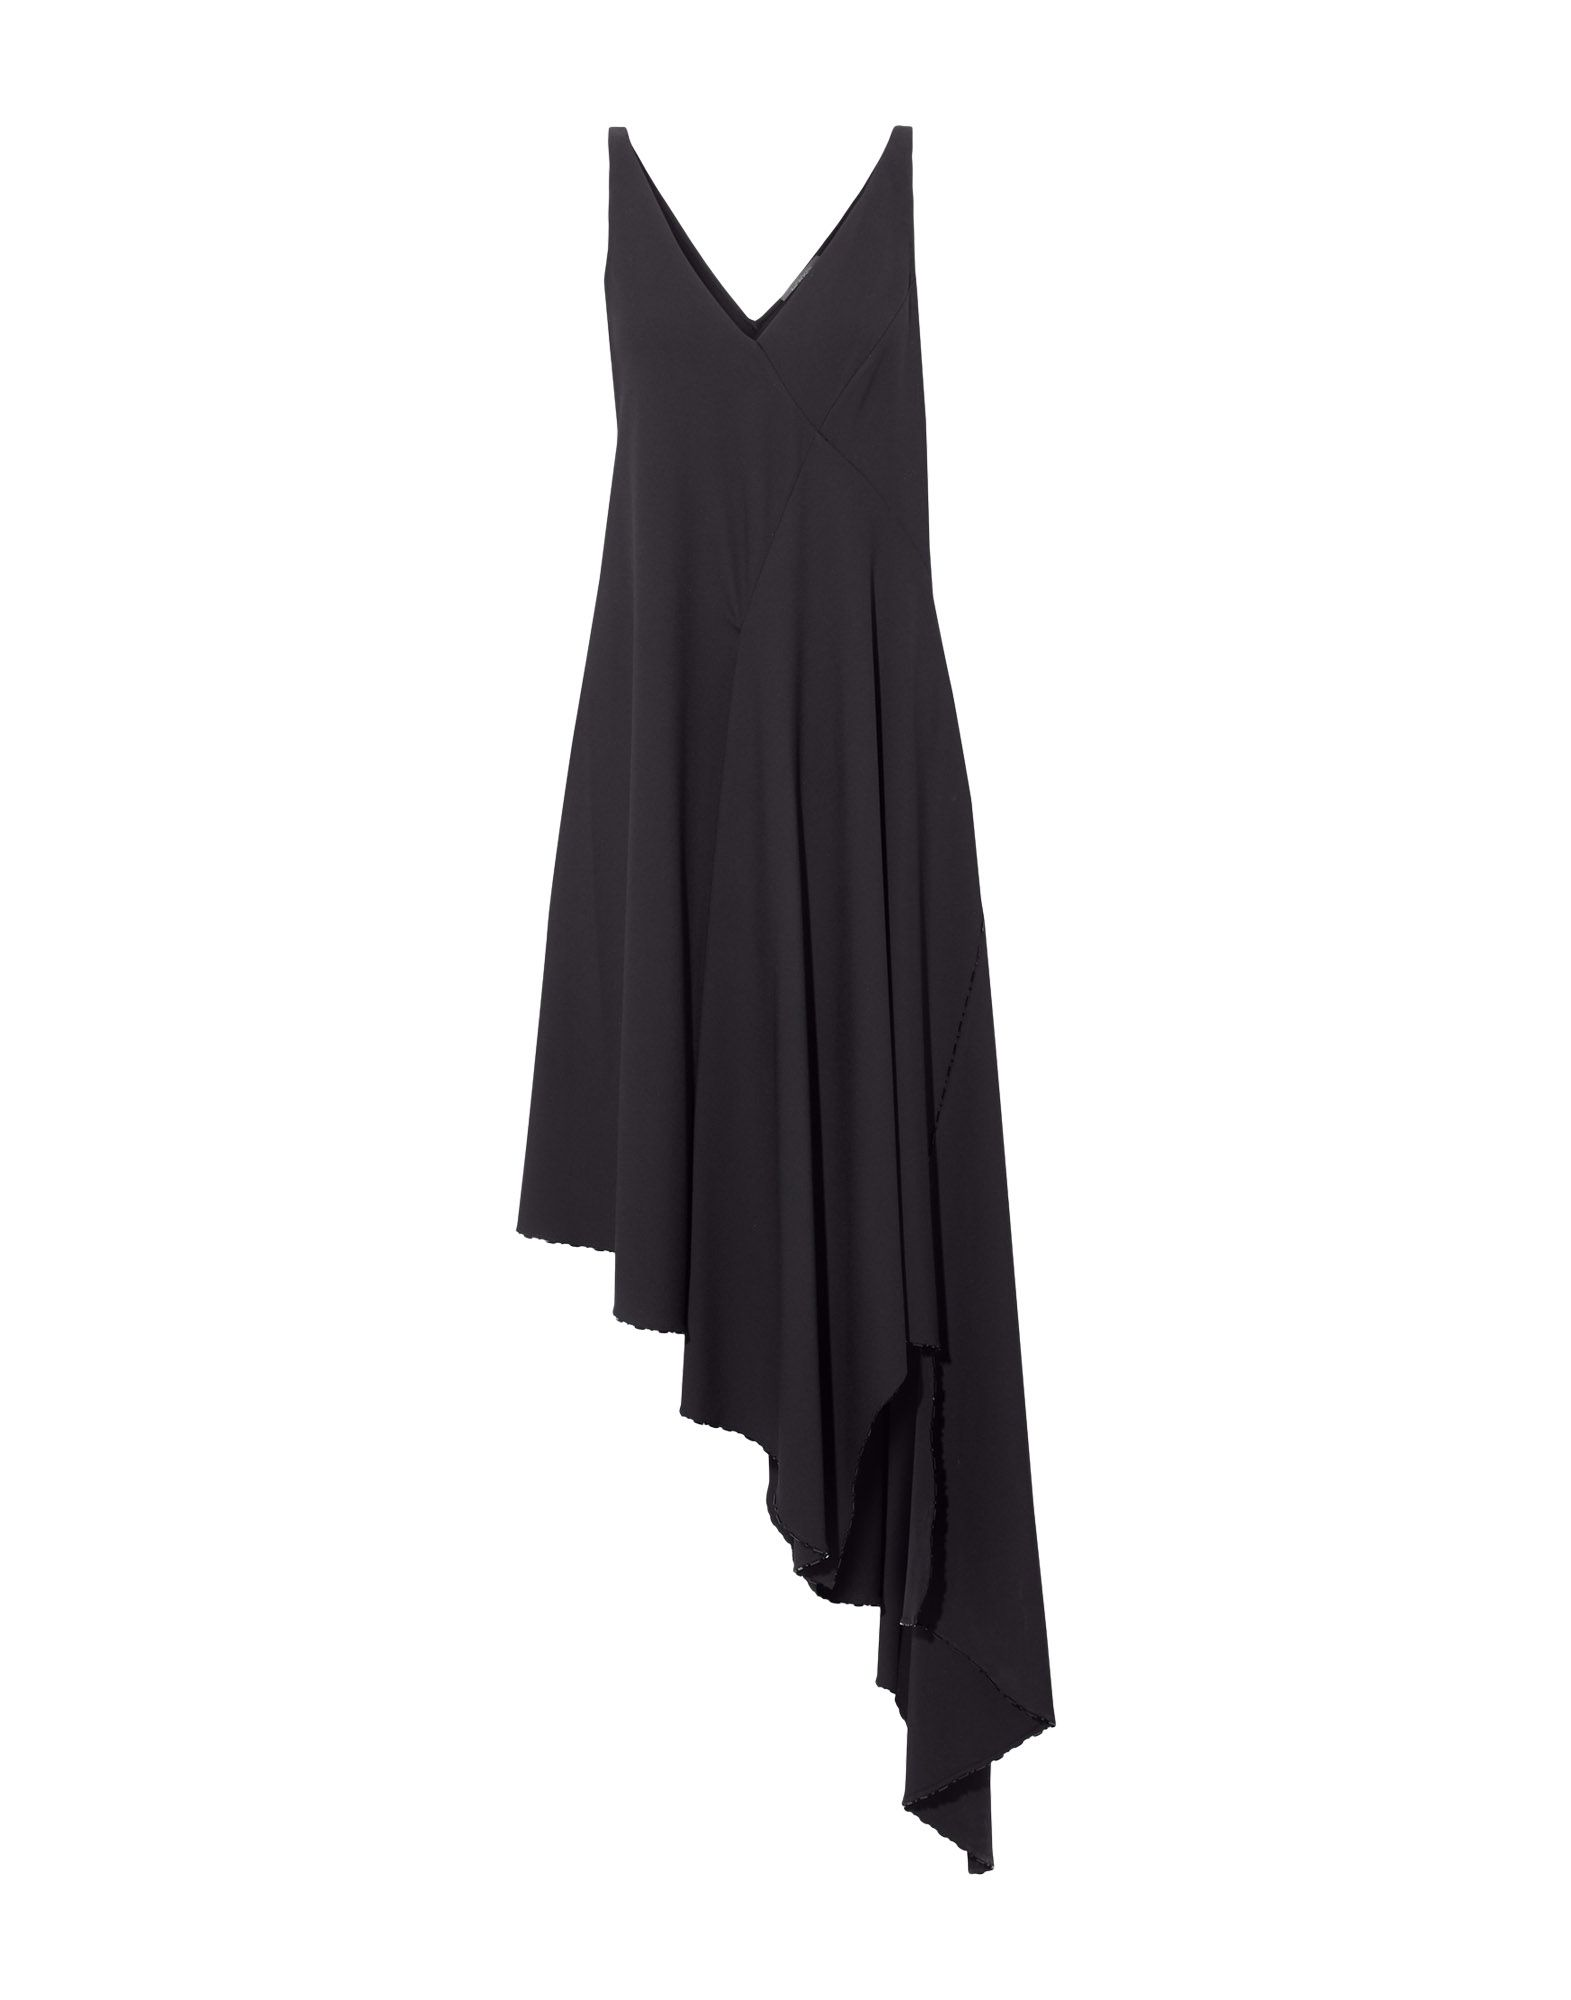 ZAC POSEN Платье длиной 3/4 цены онлайн